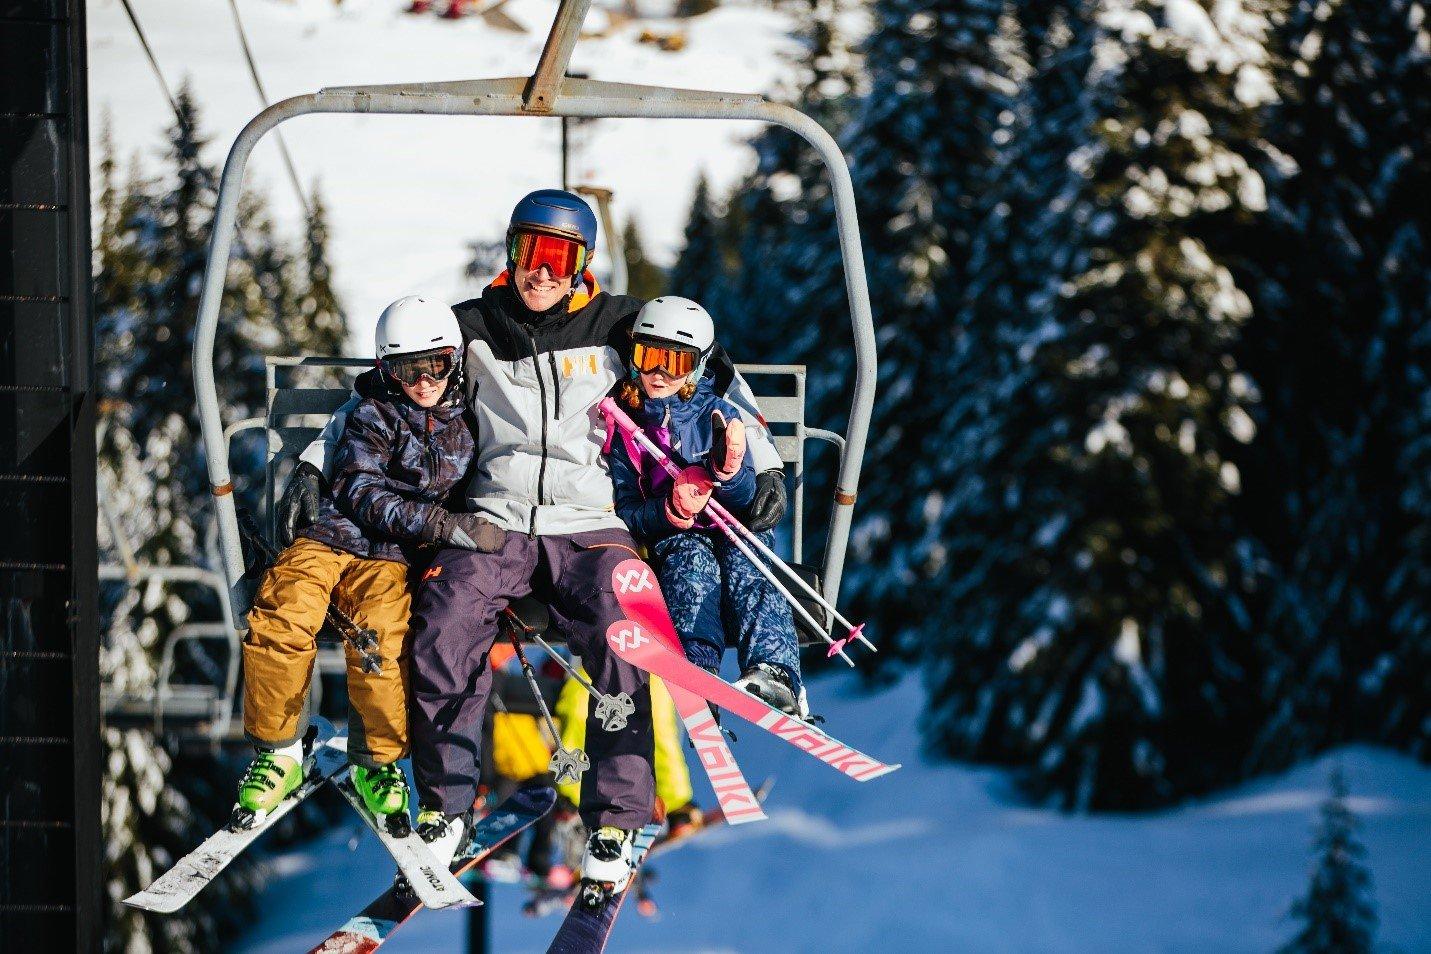 Oregon's Most Family-Friendly Ski Resorts